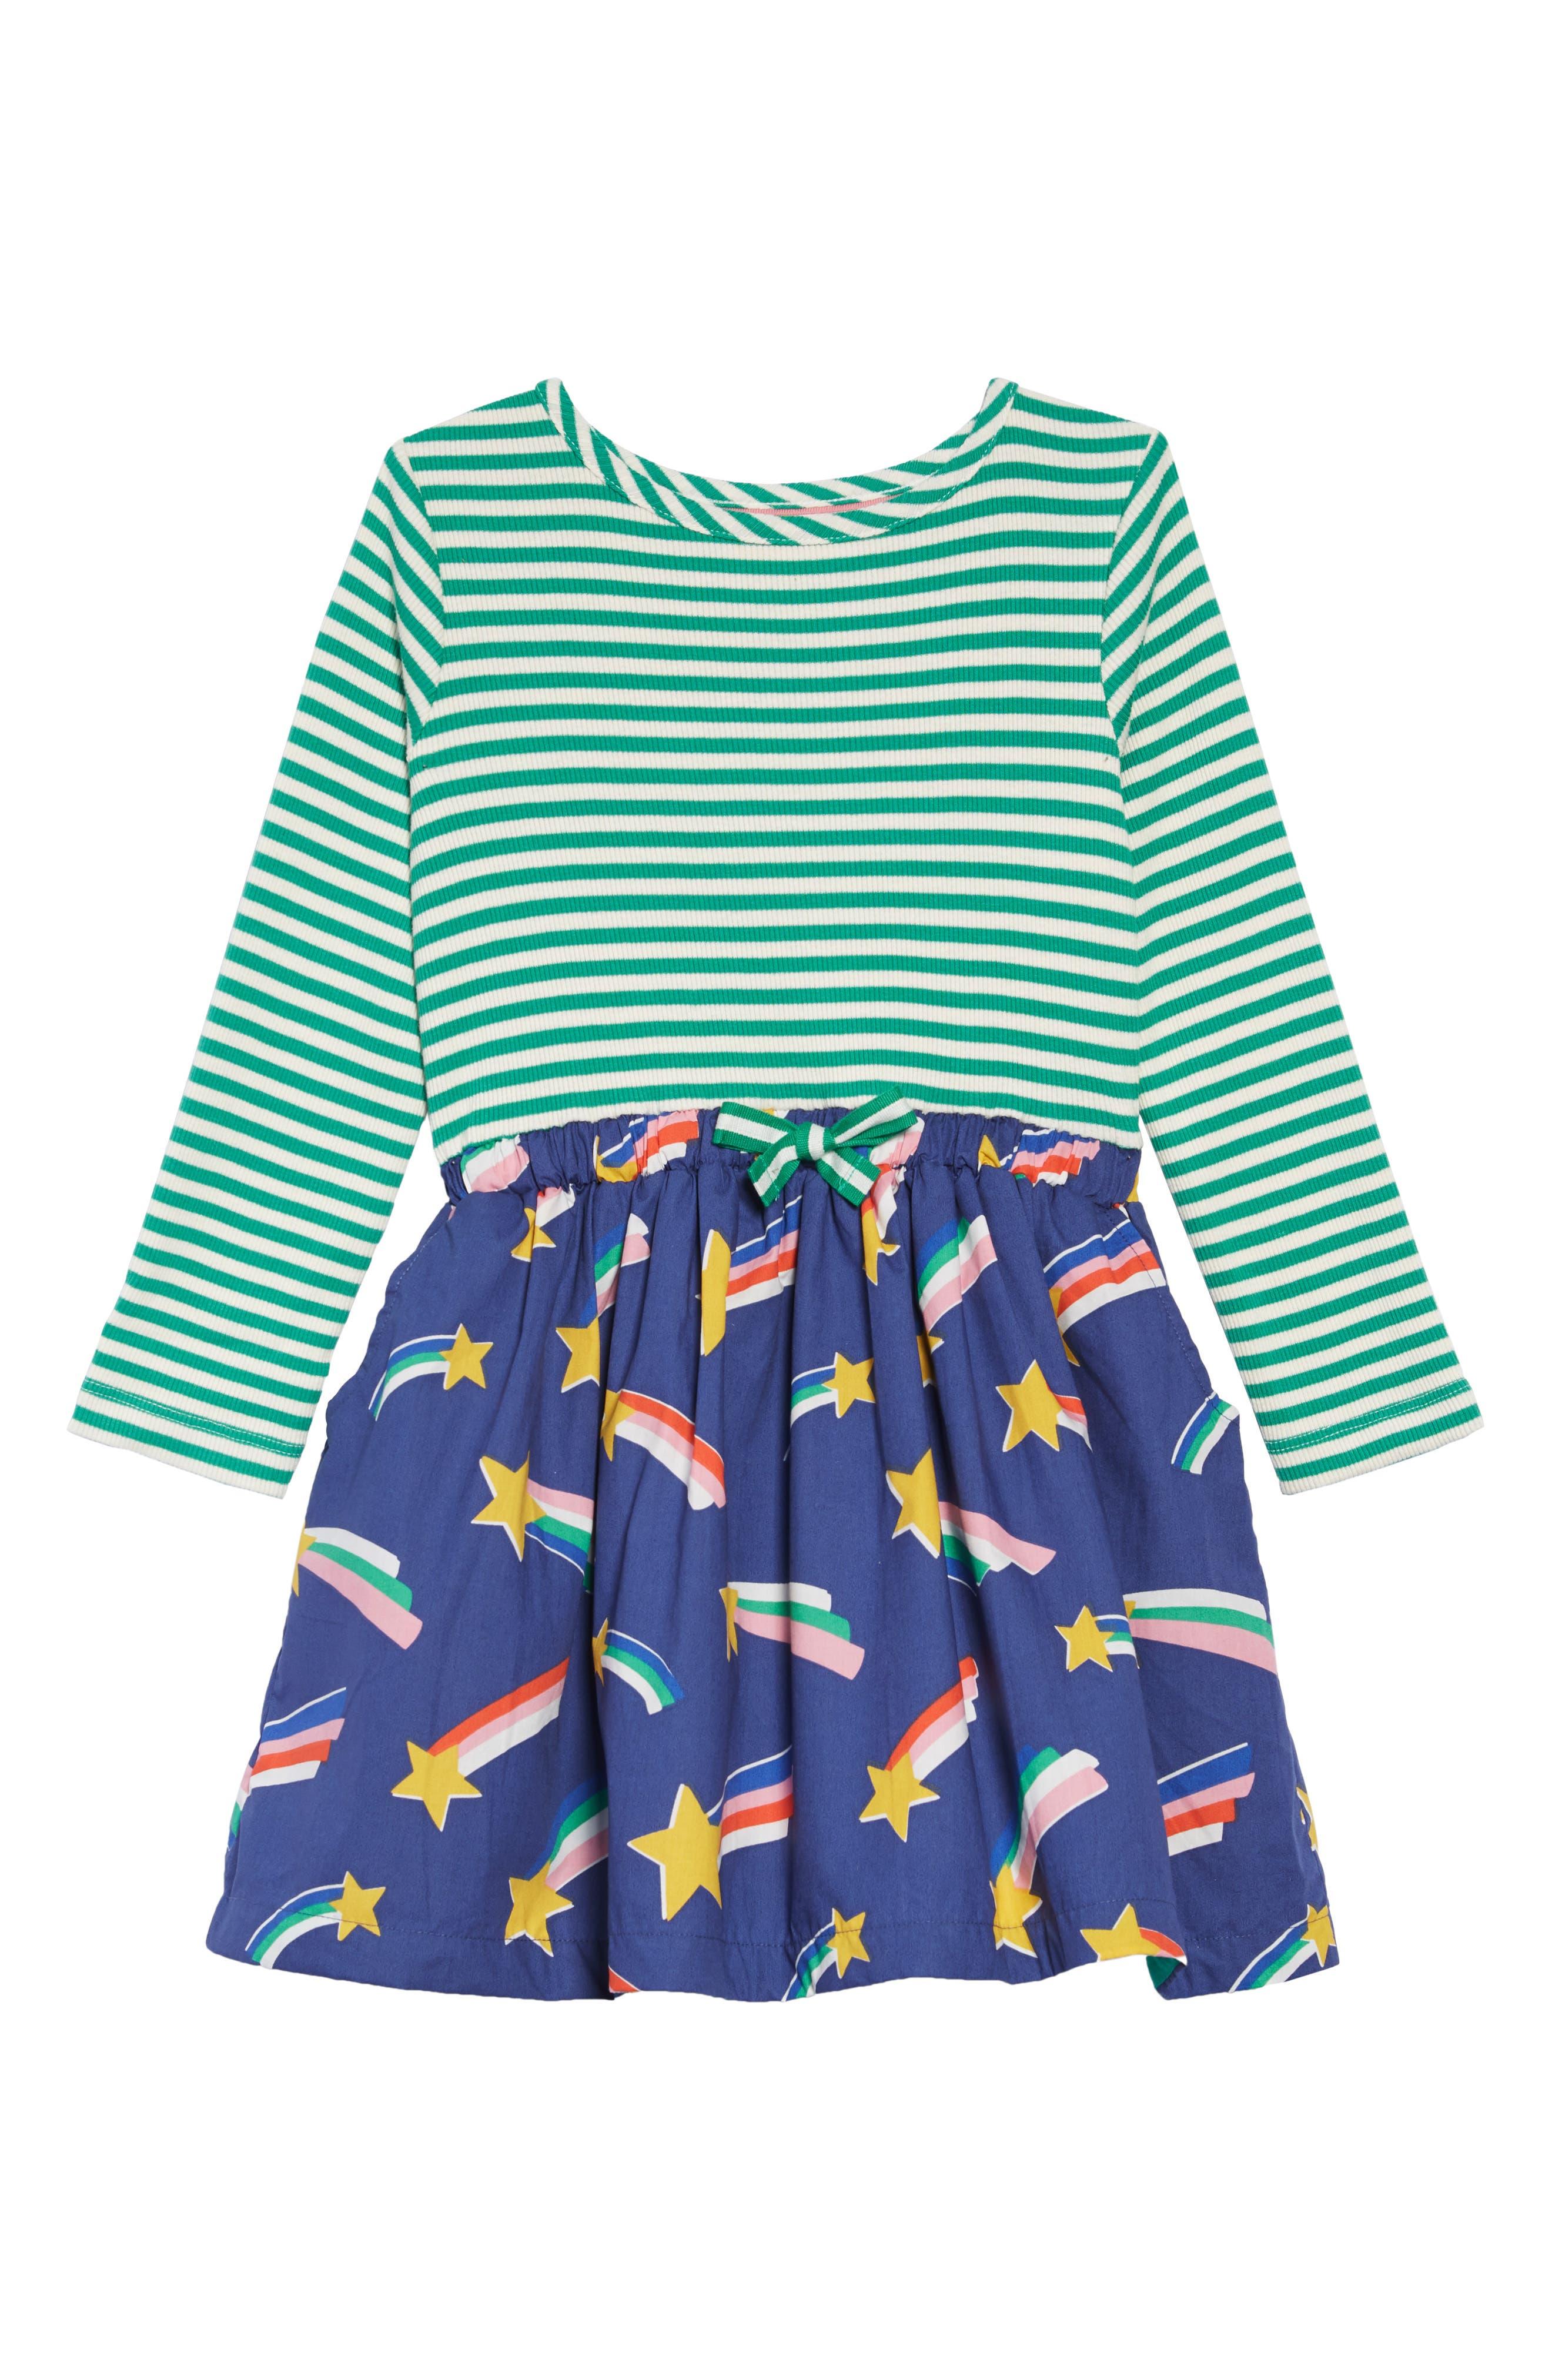 Hopscotch Dress,                         Main,                         color, 414